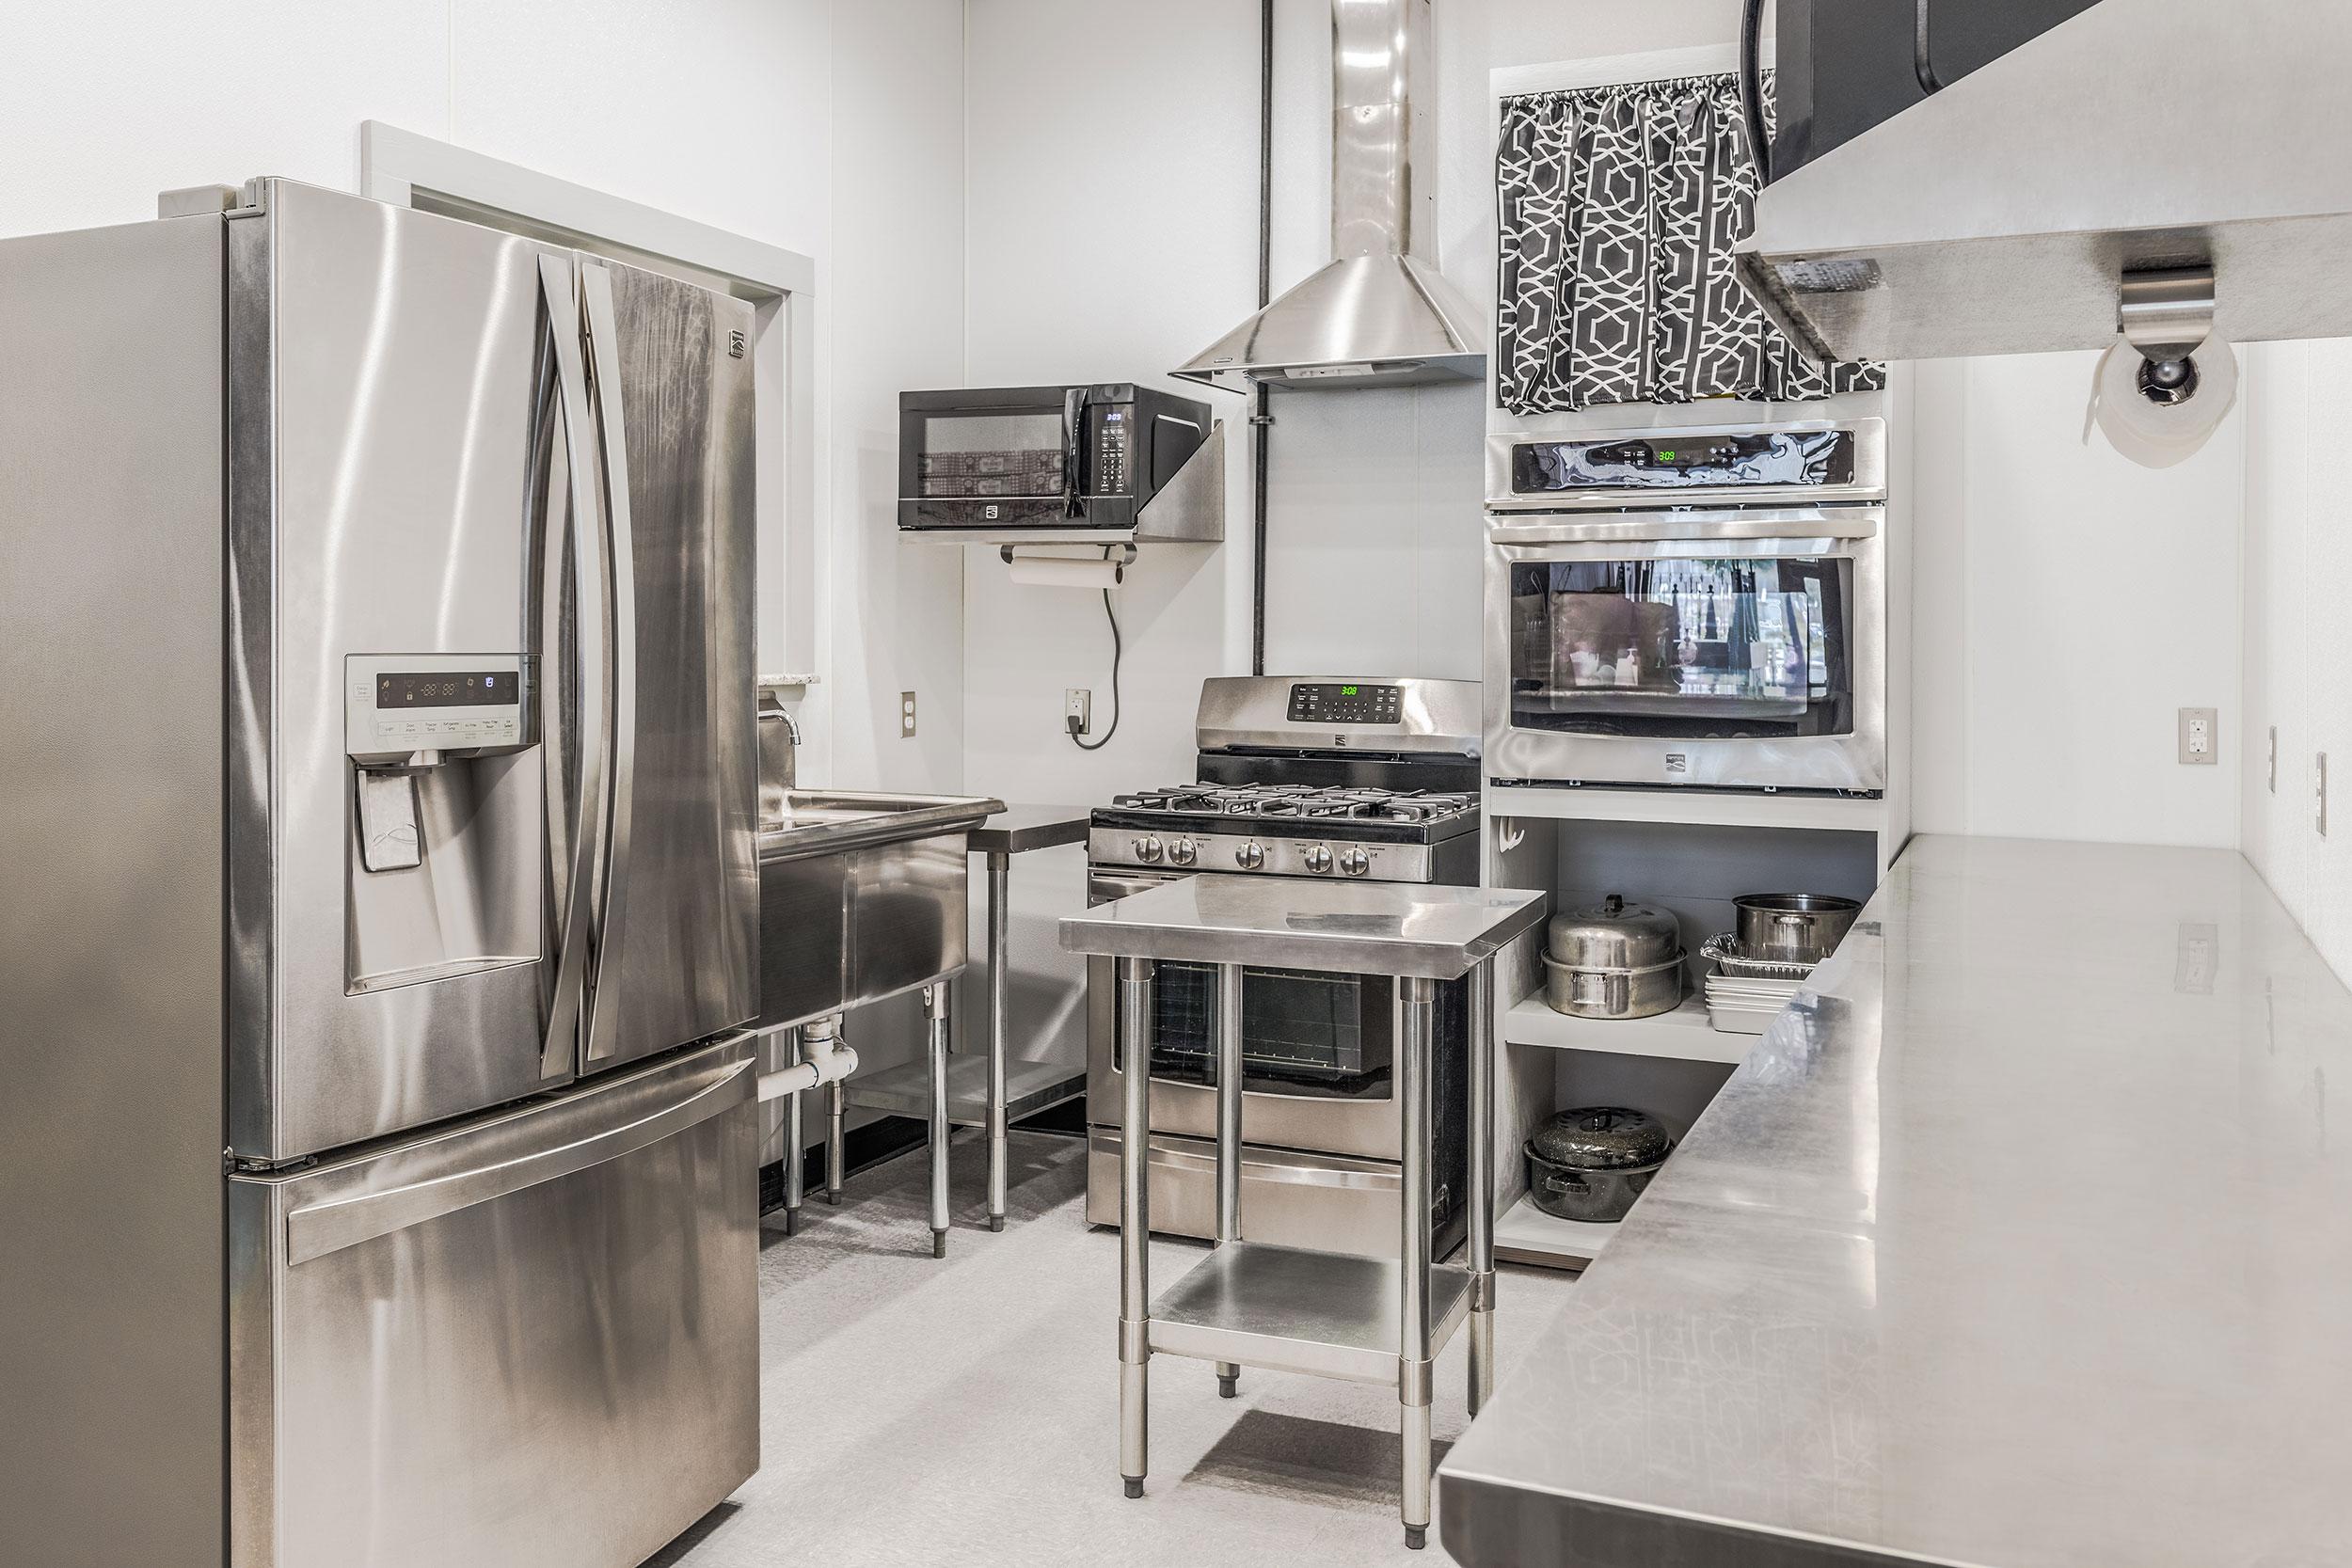 Rathbone Hall Caterer's Kitchen